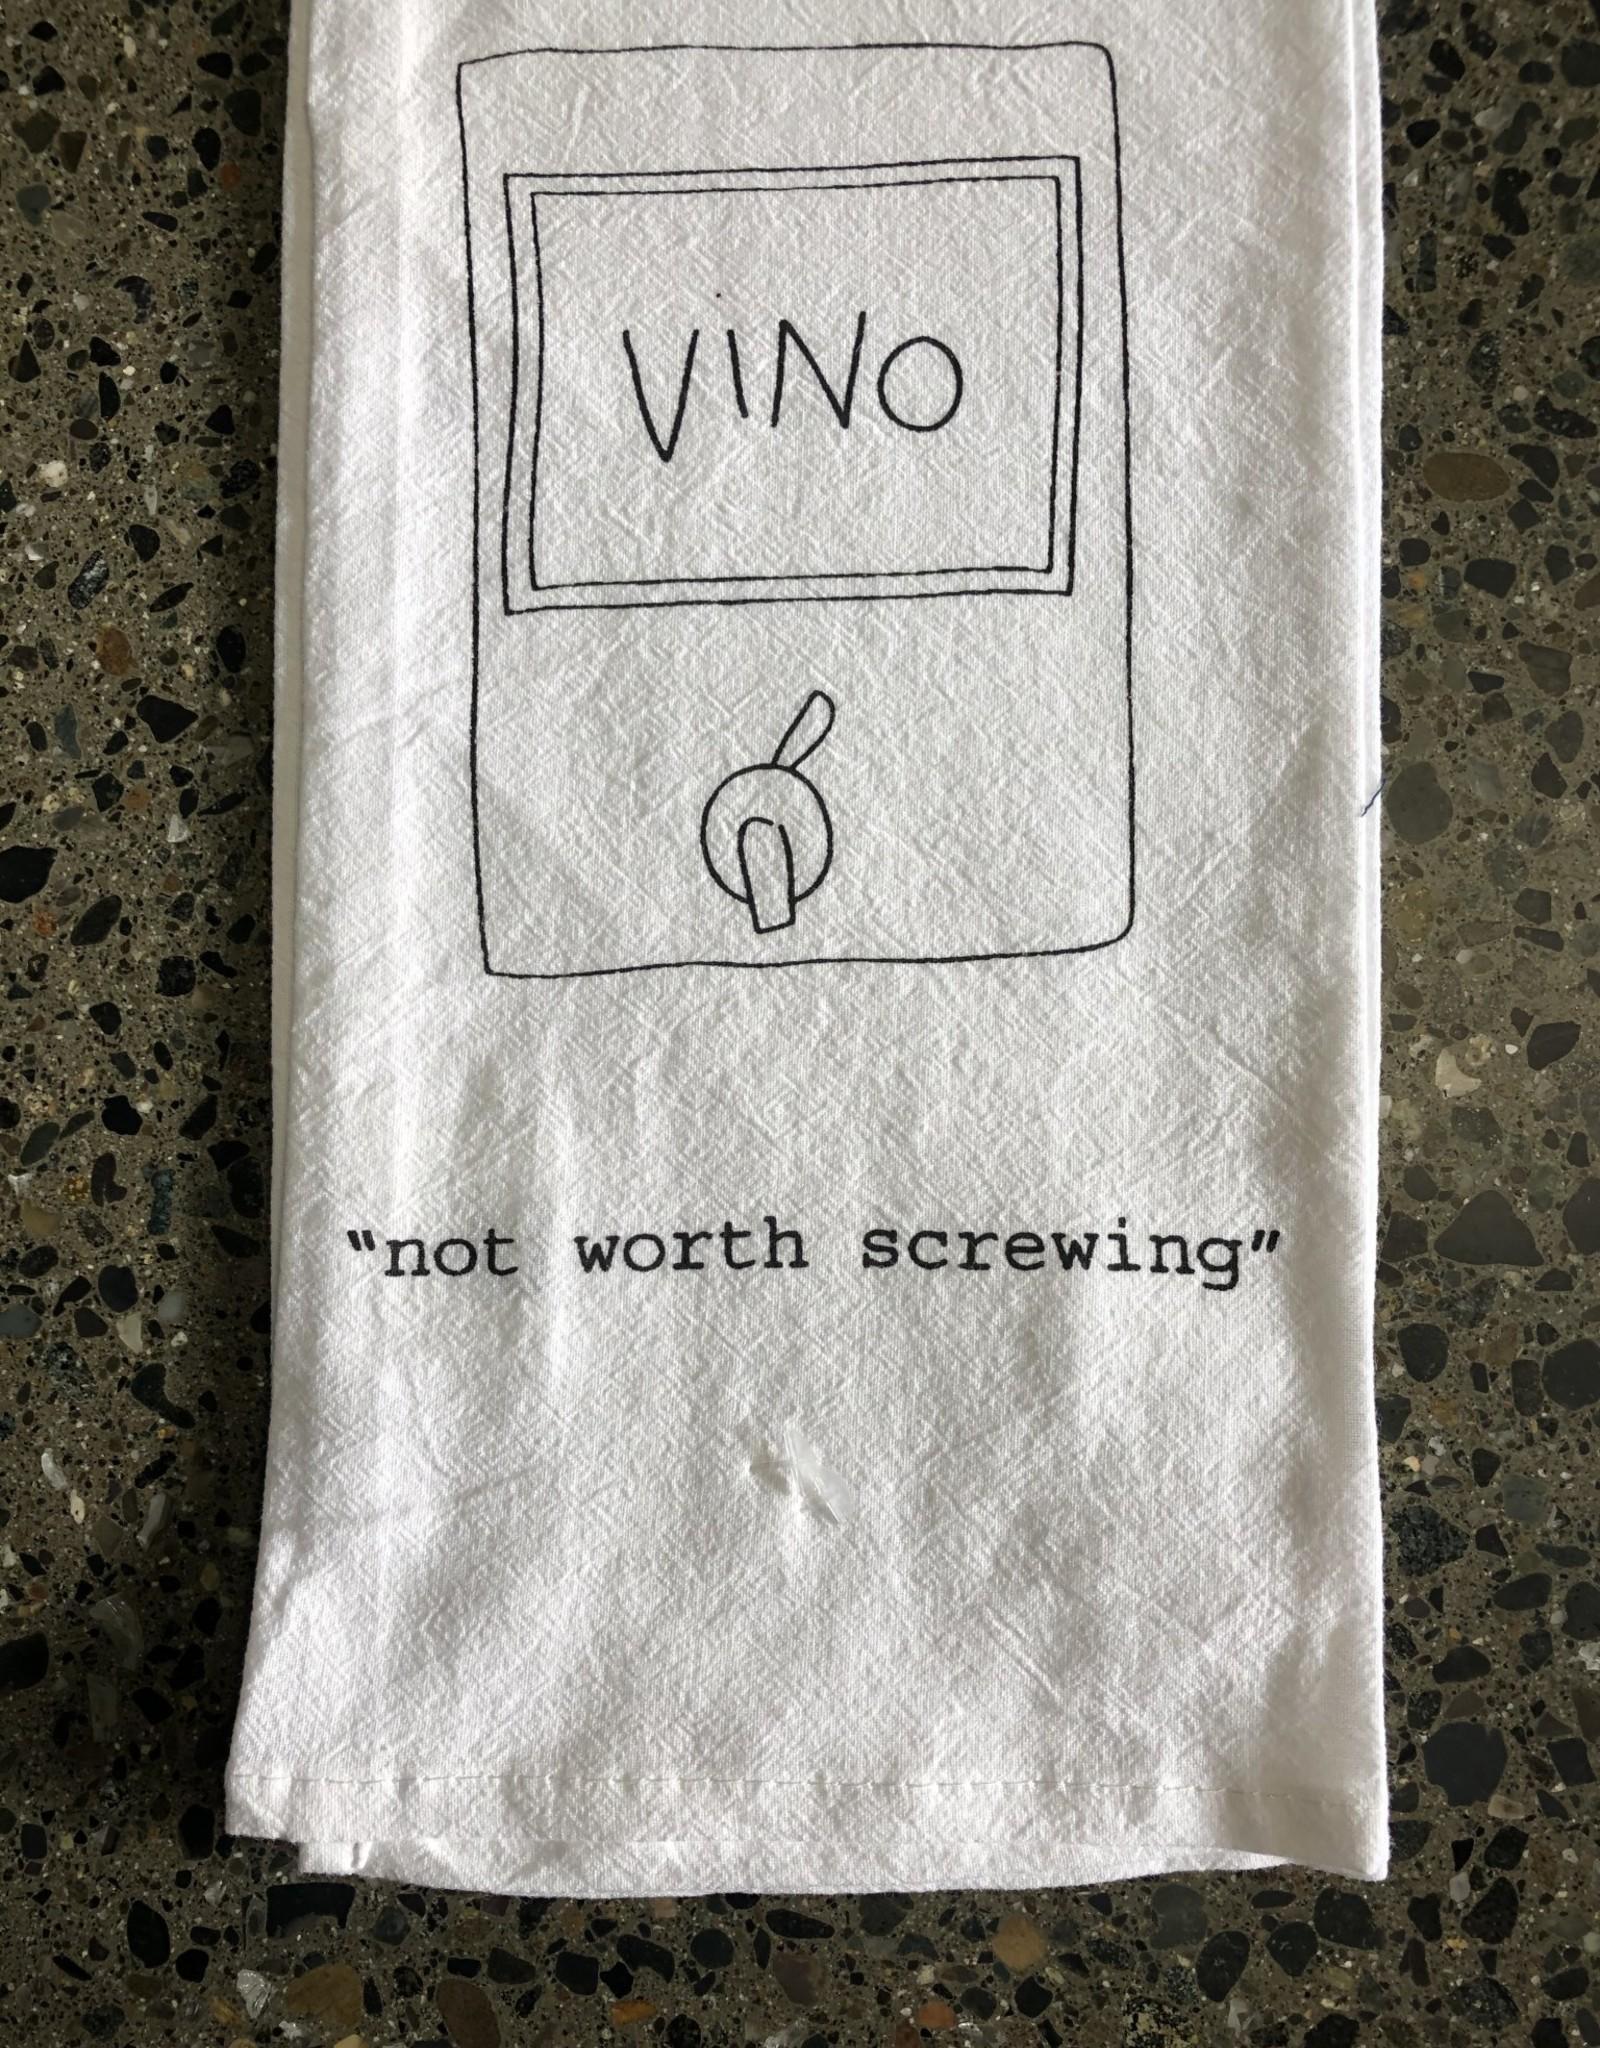 LeBLANC finds NOT WORTH SCREWING tea towel